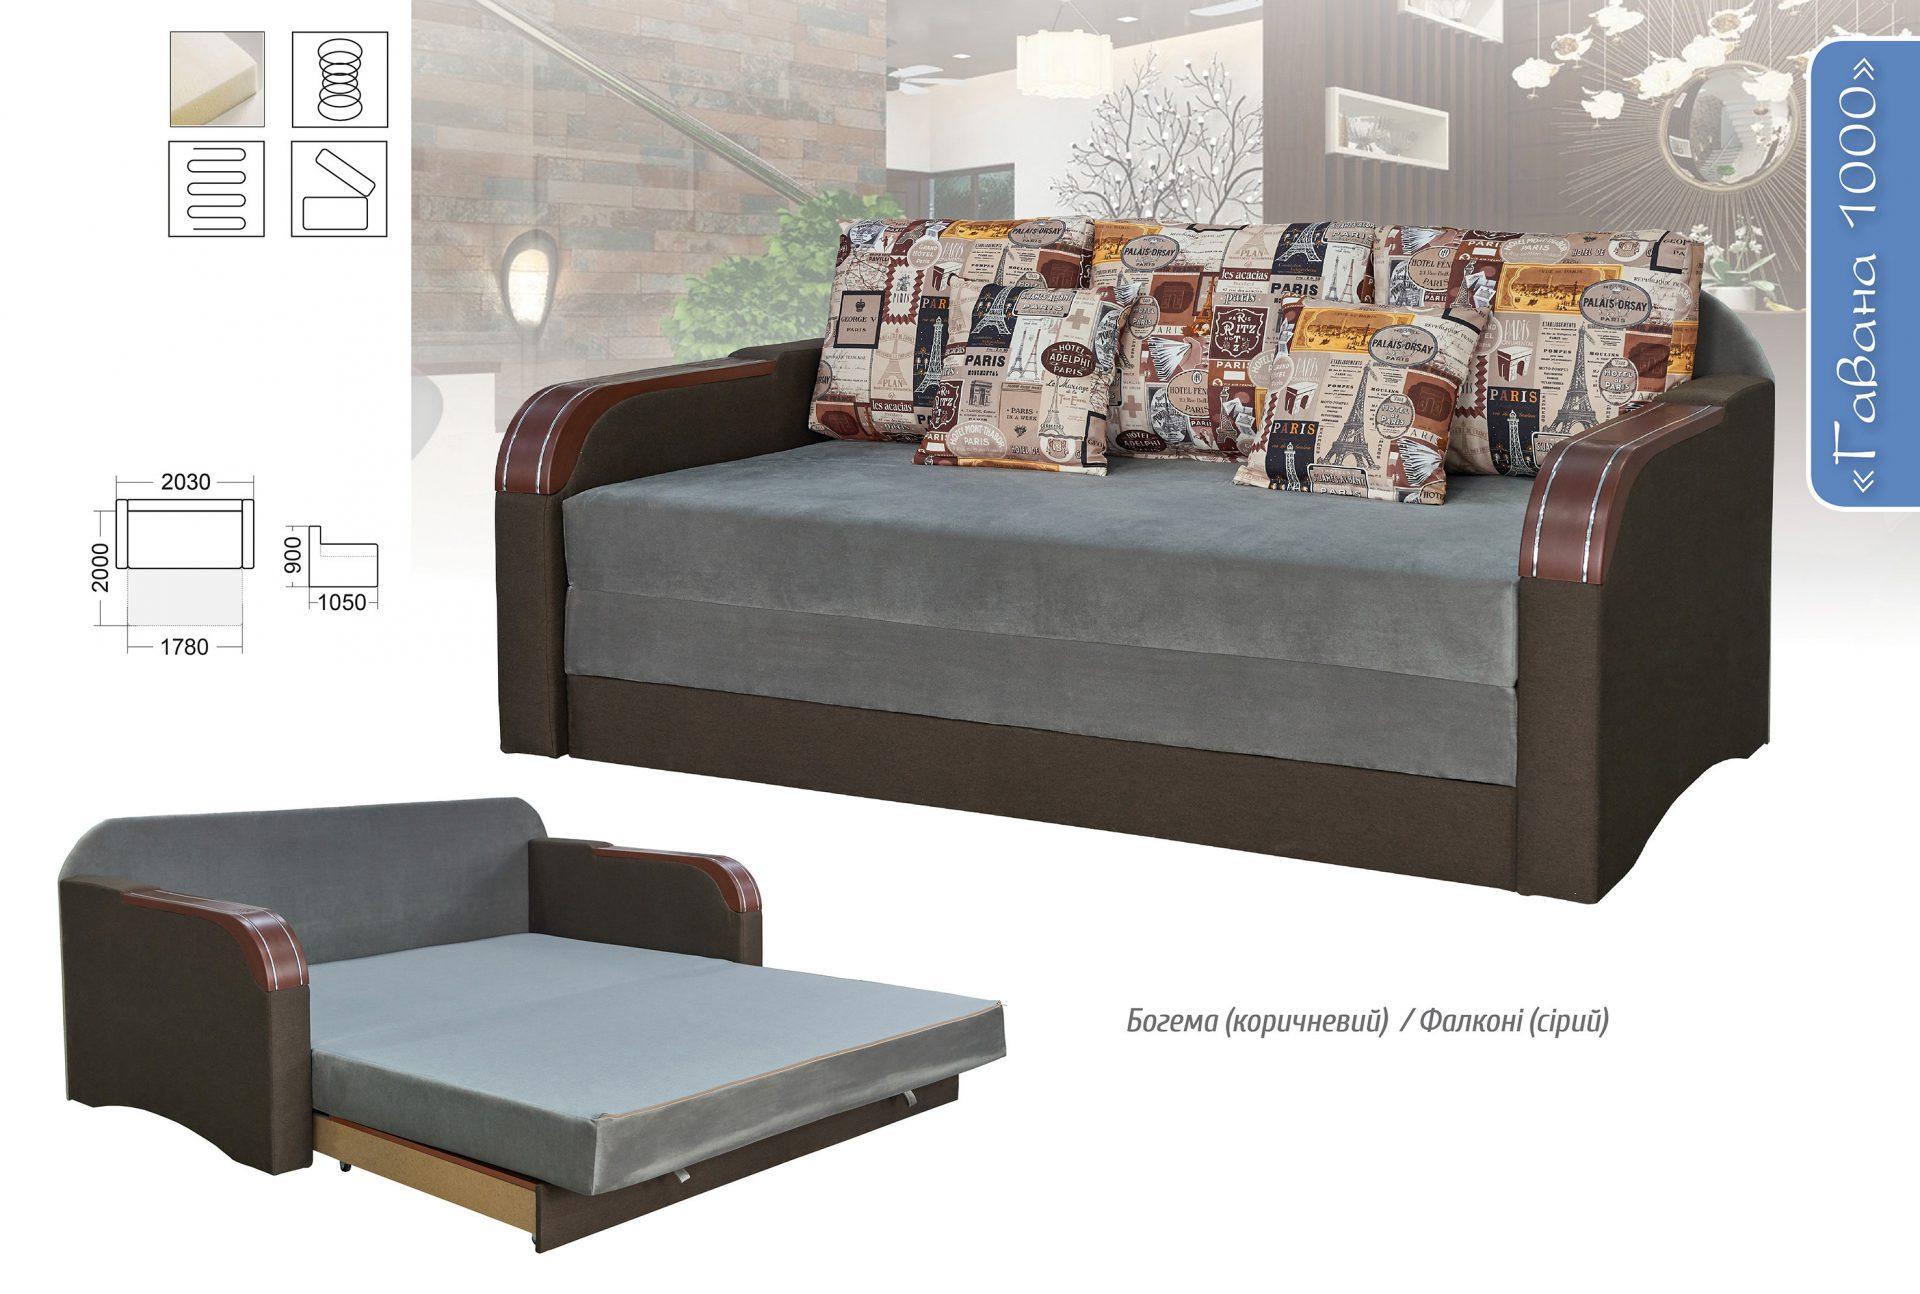 Гавана диван купить недорого киев